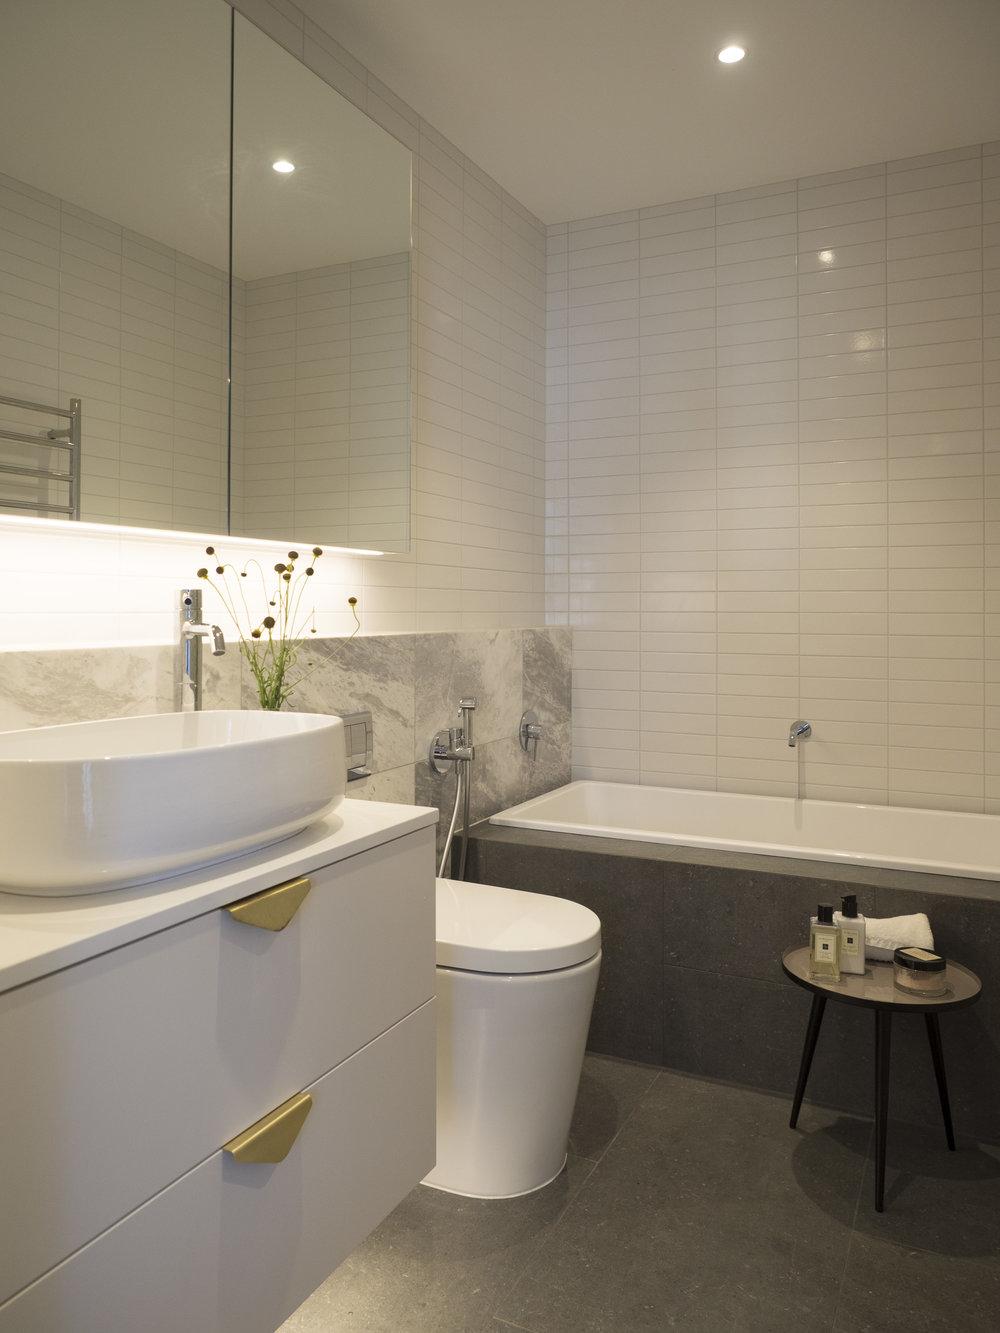 Sonya Cotter Interior Design - Residential Apartment Design